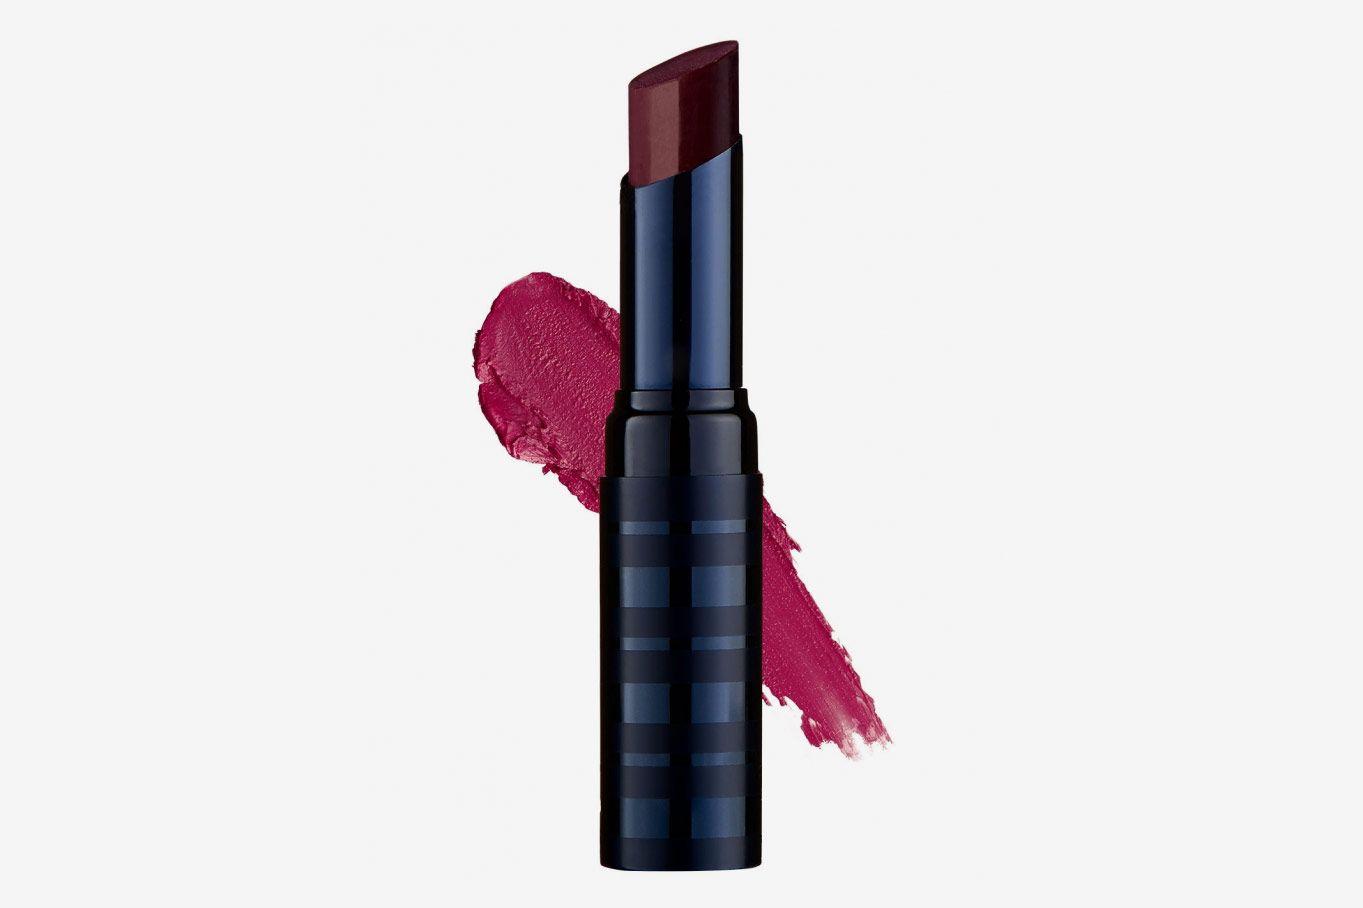 Color Intense Lipstick in Twilight